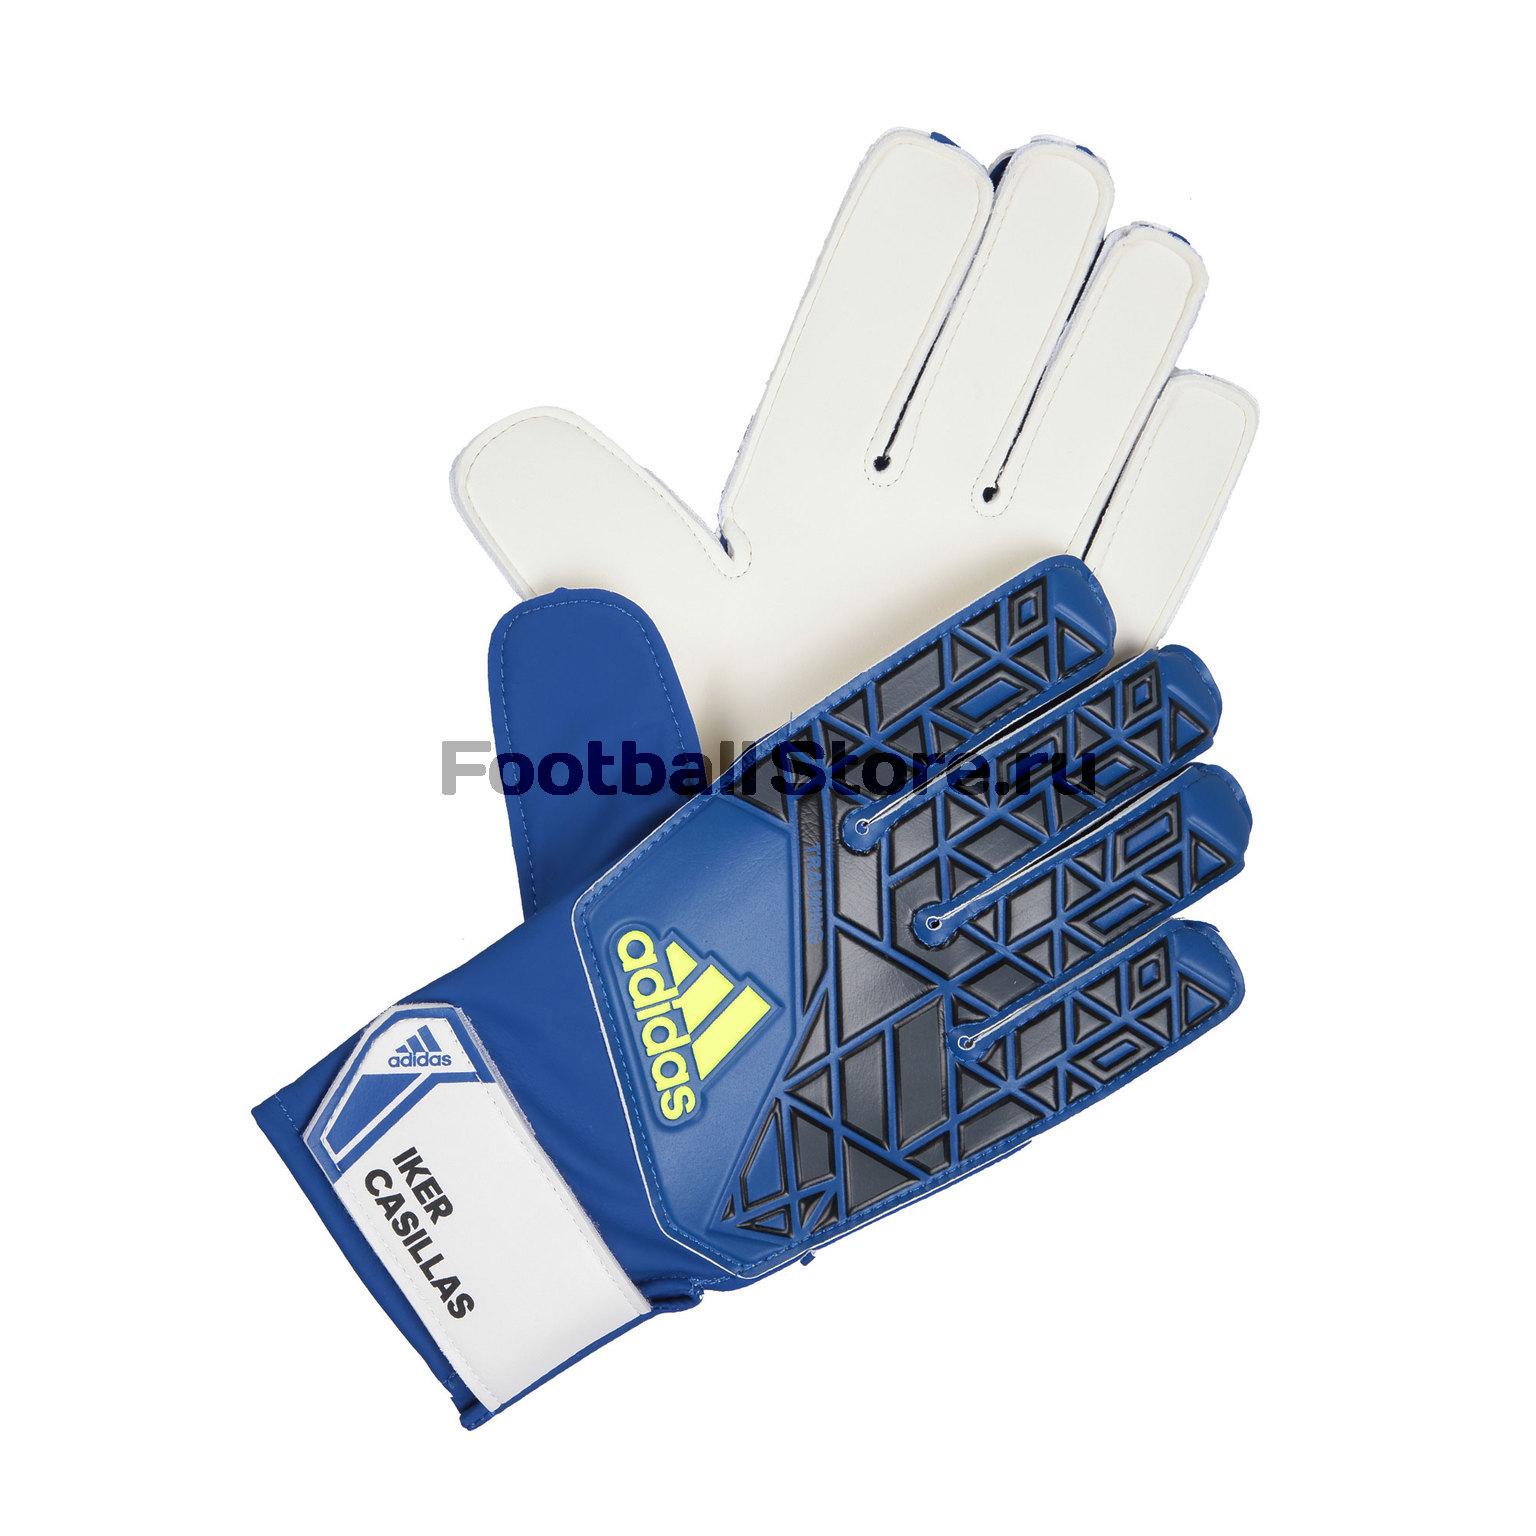 Перчатки вратарские Adidas ACE Traning IC AP7014 перчатки adidas перчатки adidas ace zones ultim ah7802